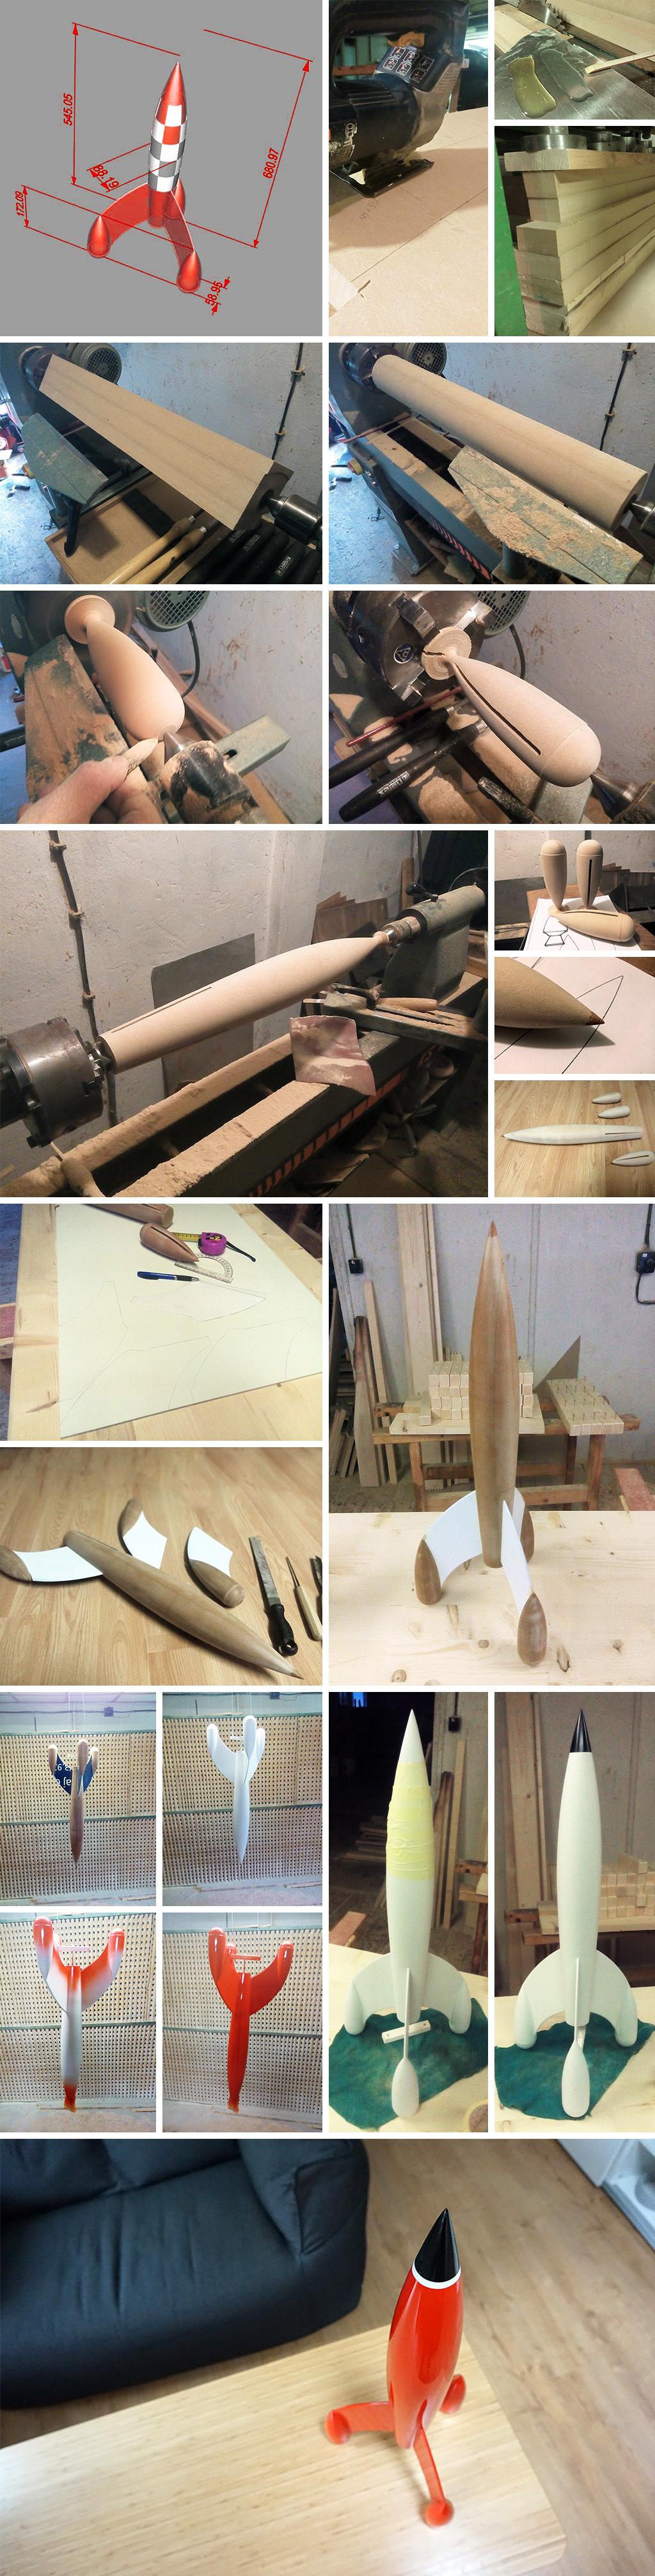 raketa-kolaz-vyroba-2